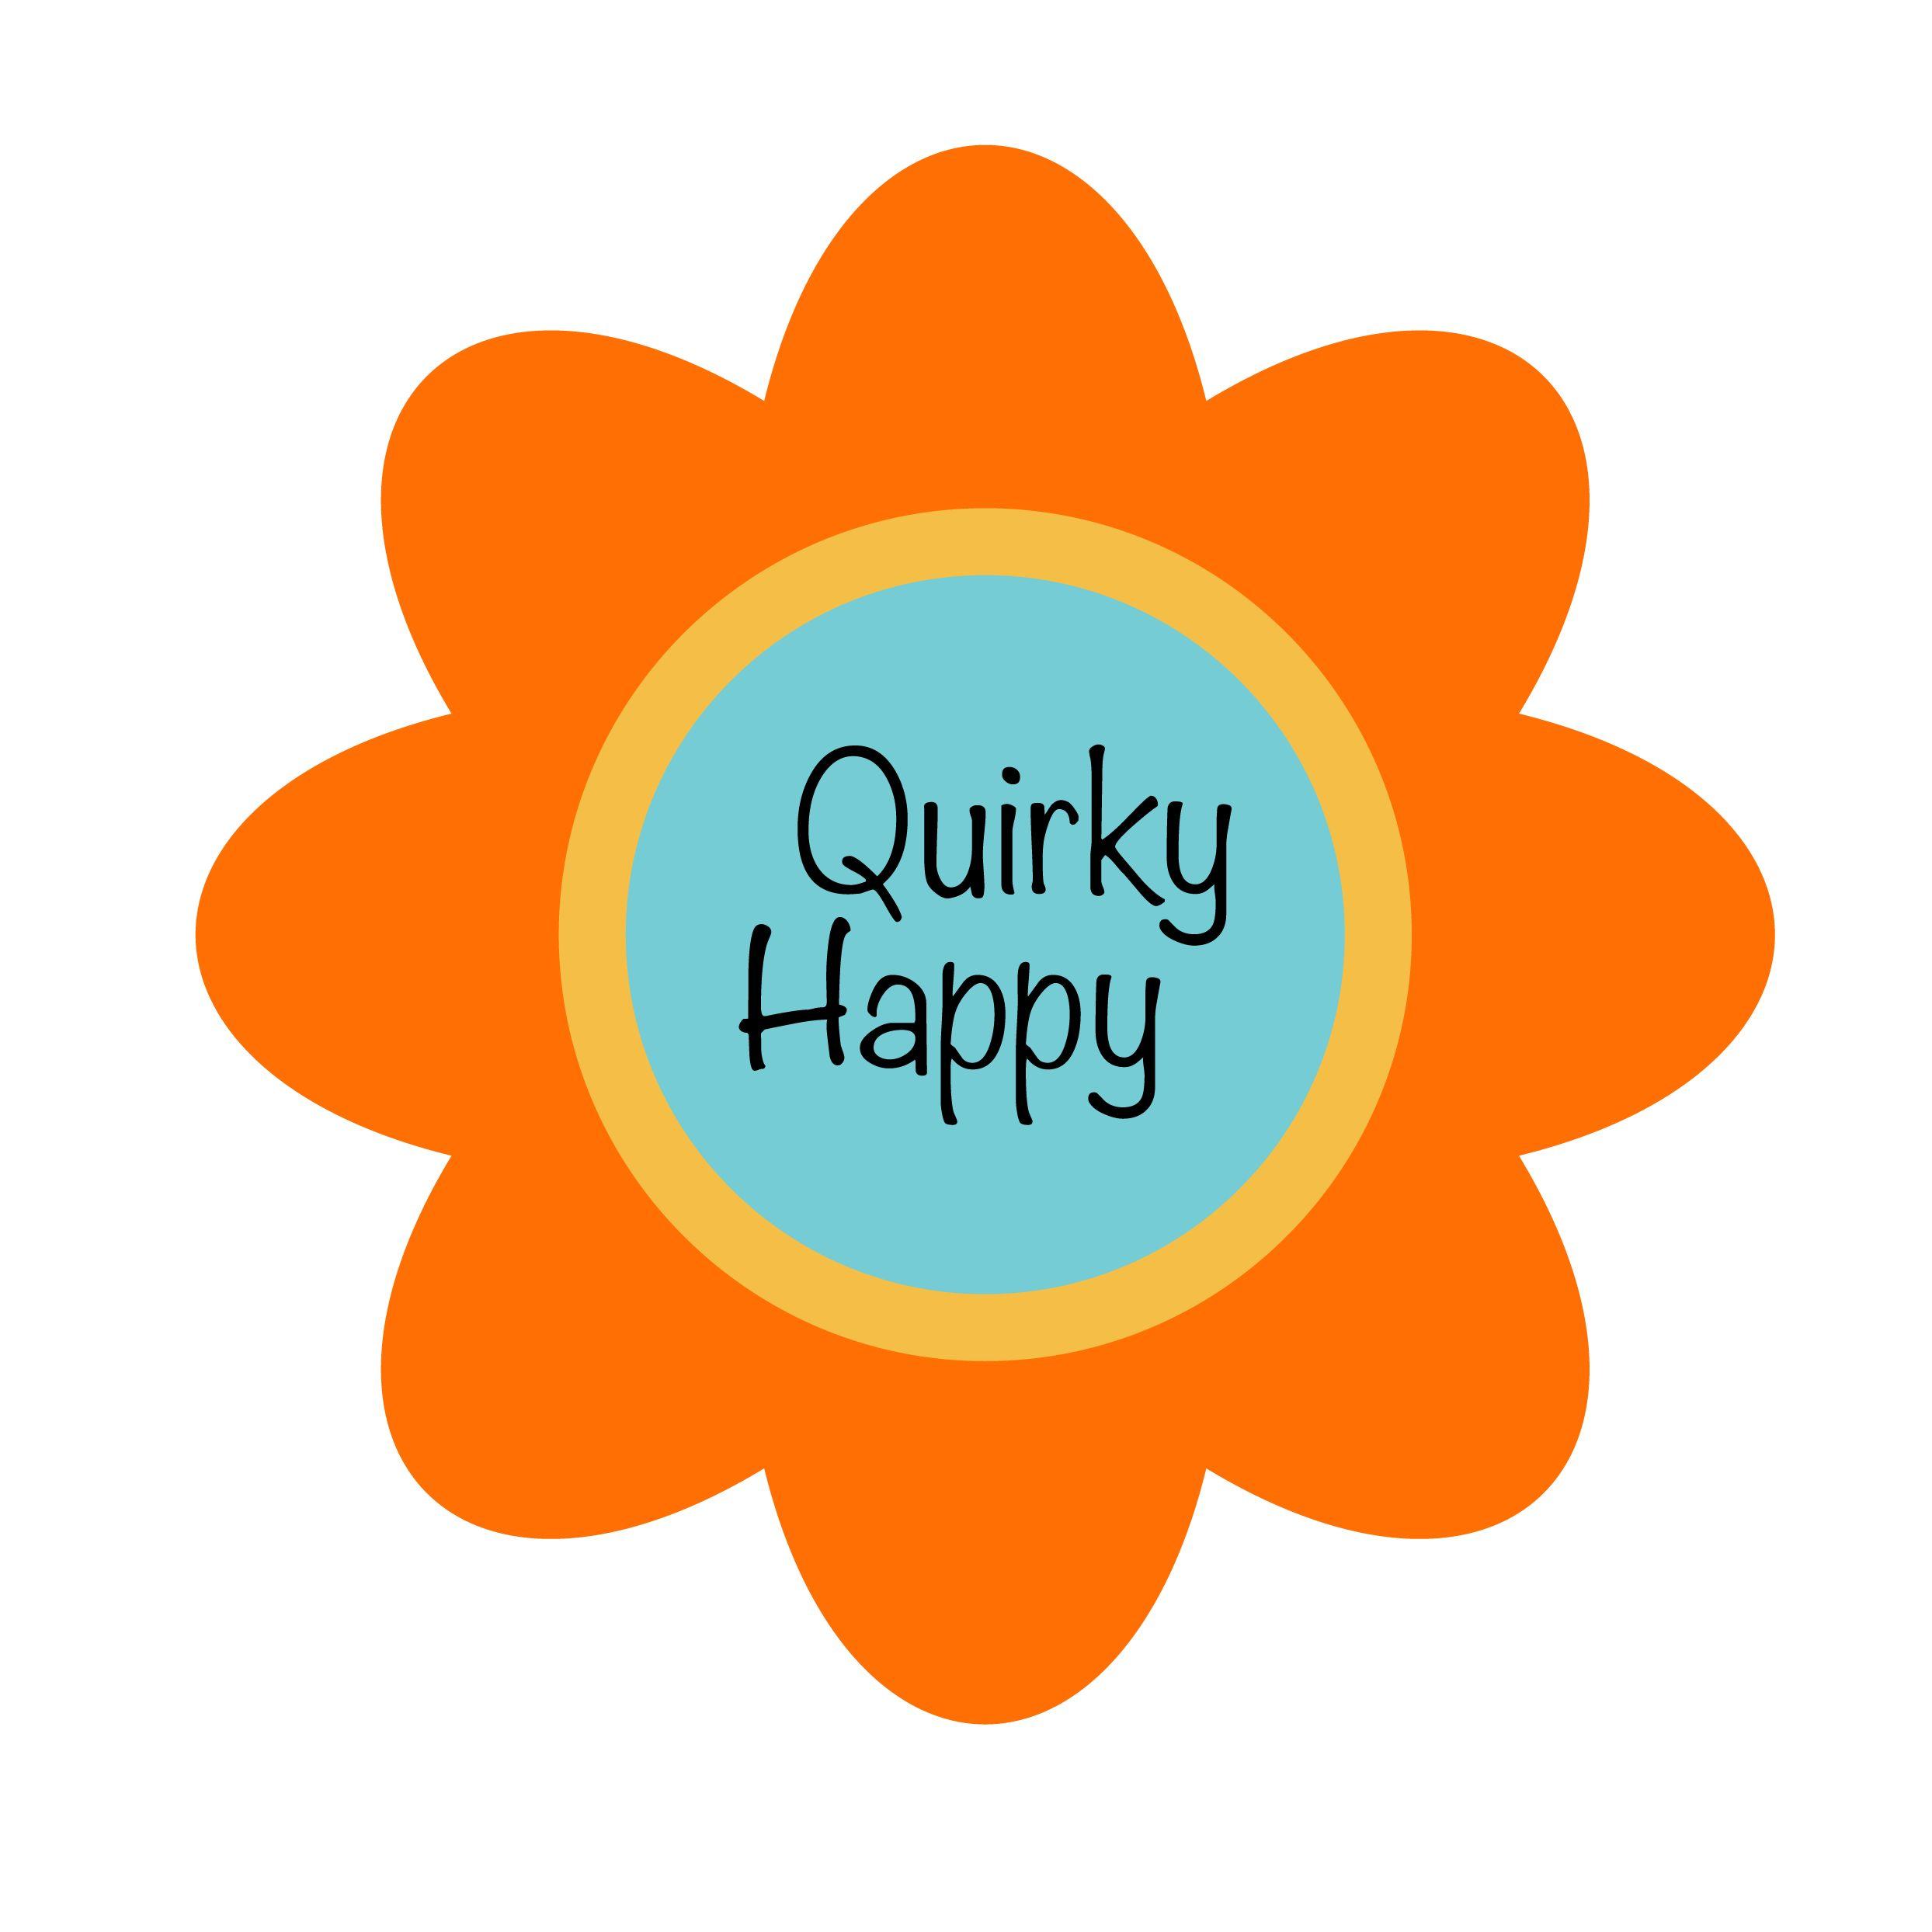 Quirky Happy